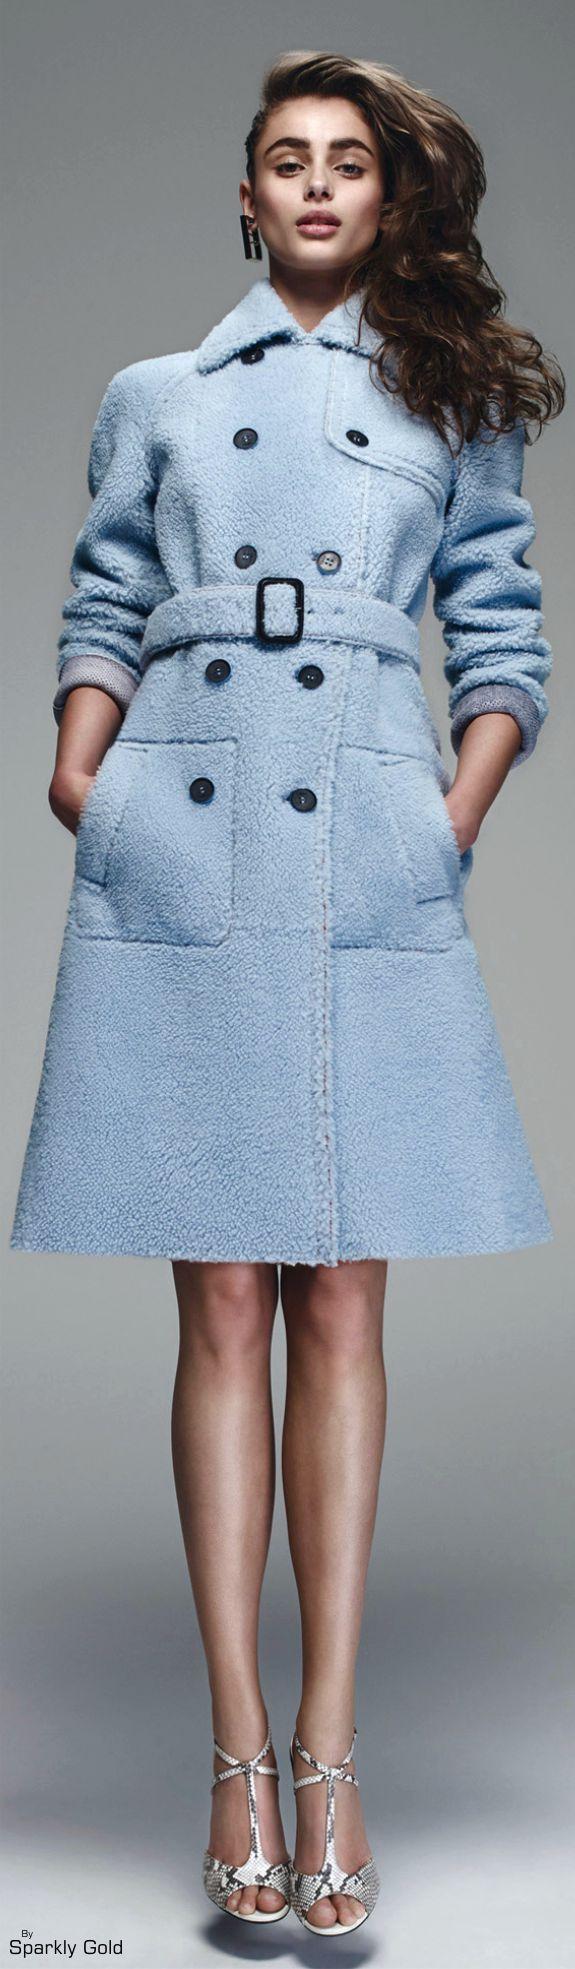 Fendi Resort 2016 blue coat women fashion outfit clothing style apparel @roressclothes closet ideas